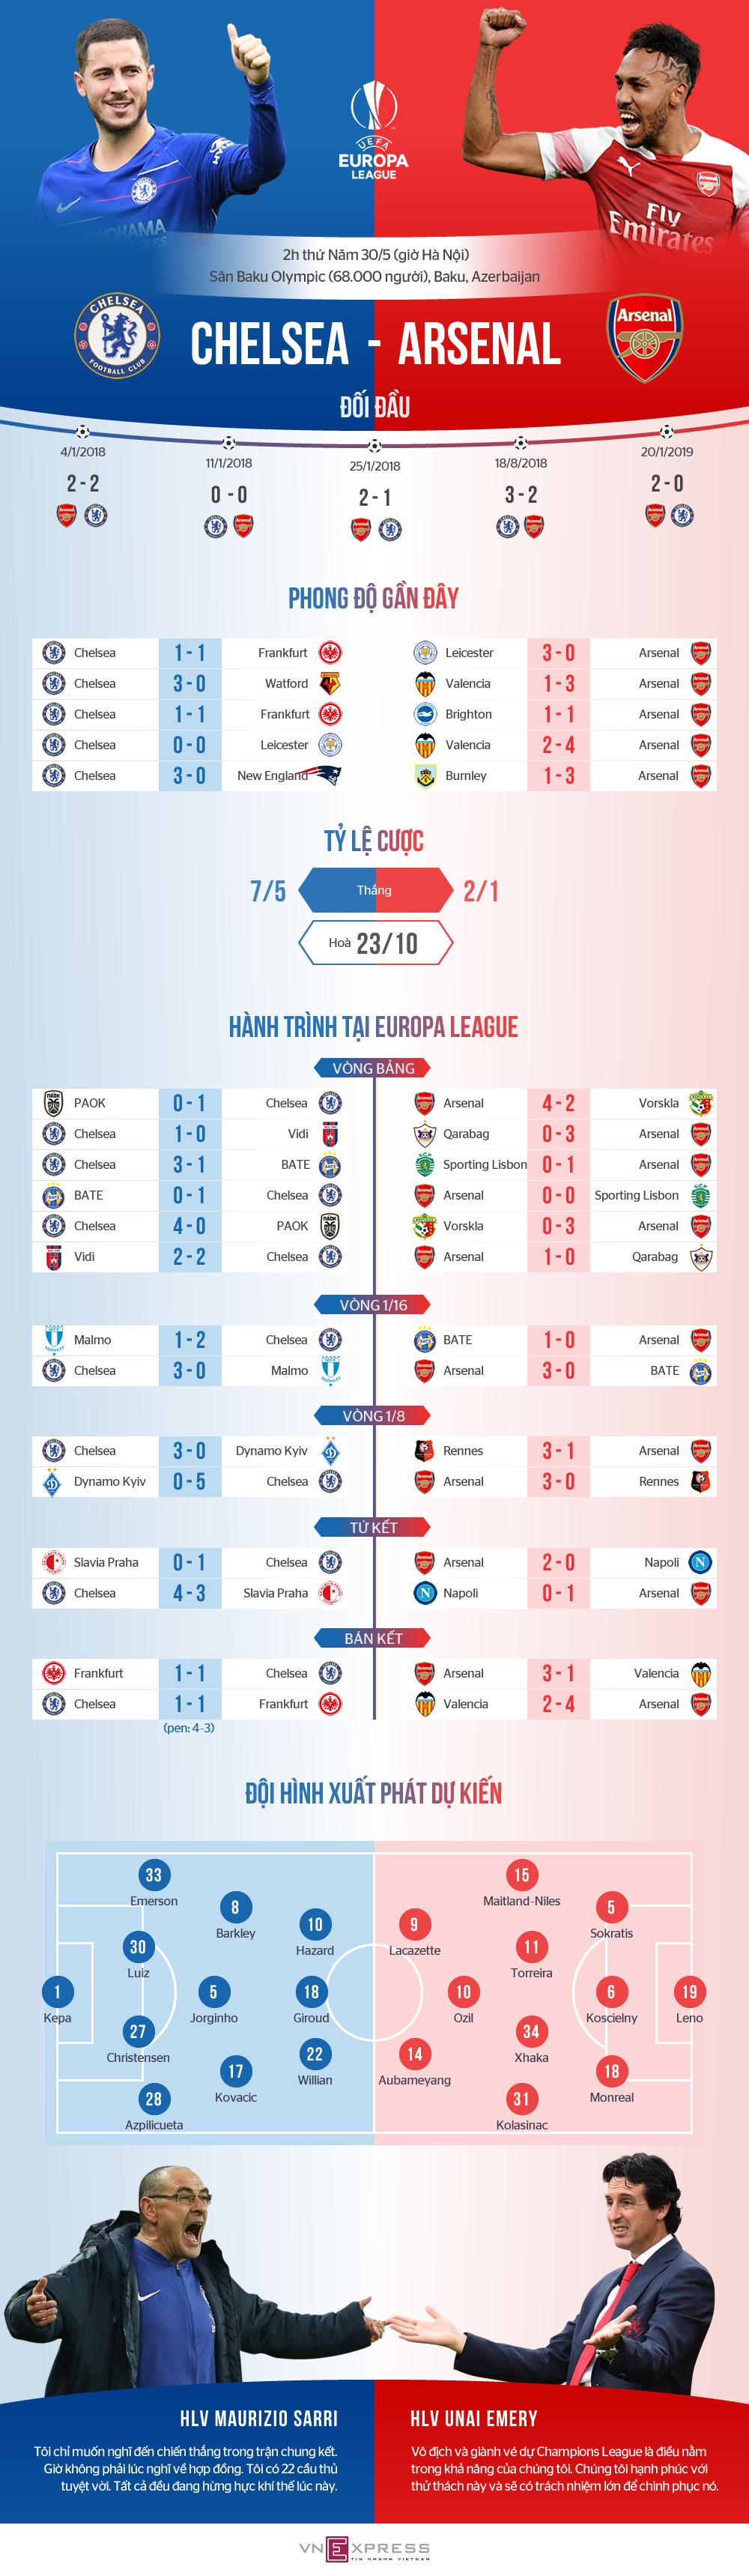 Chelsea - Arsenal: Derby London ở chung kết Europa League